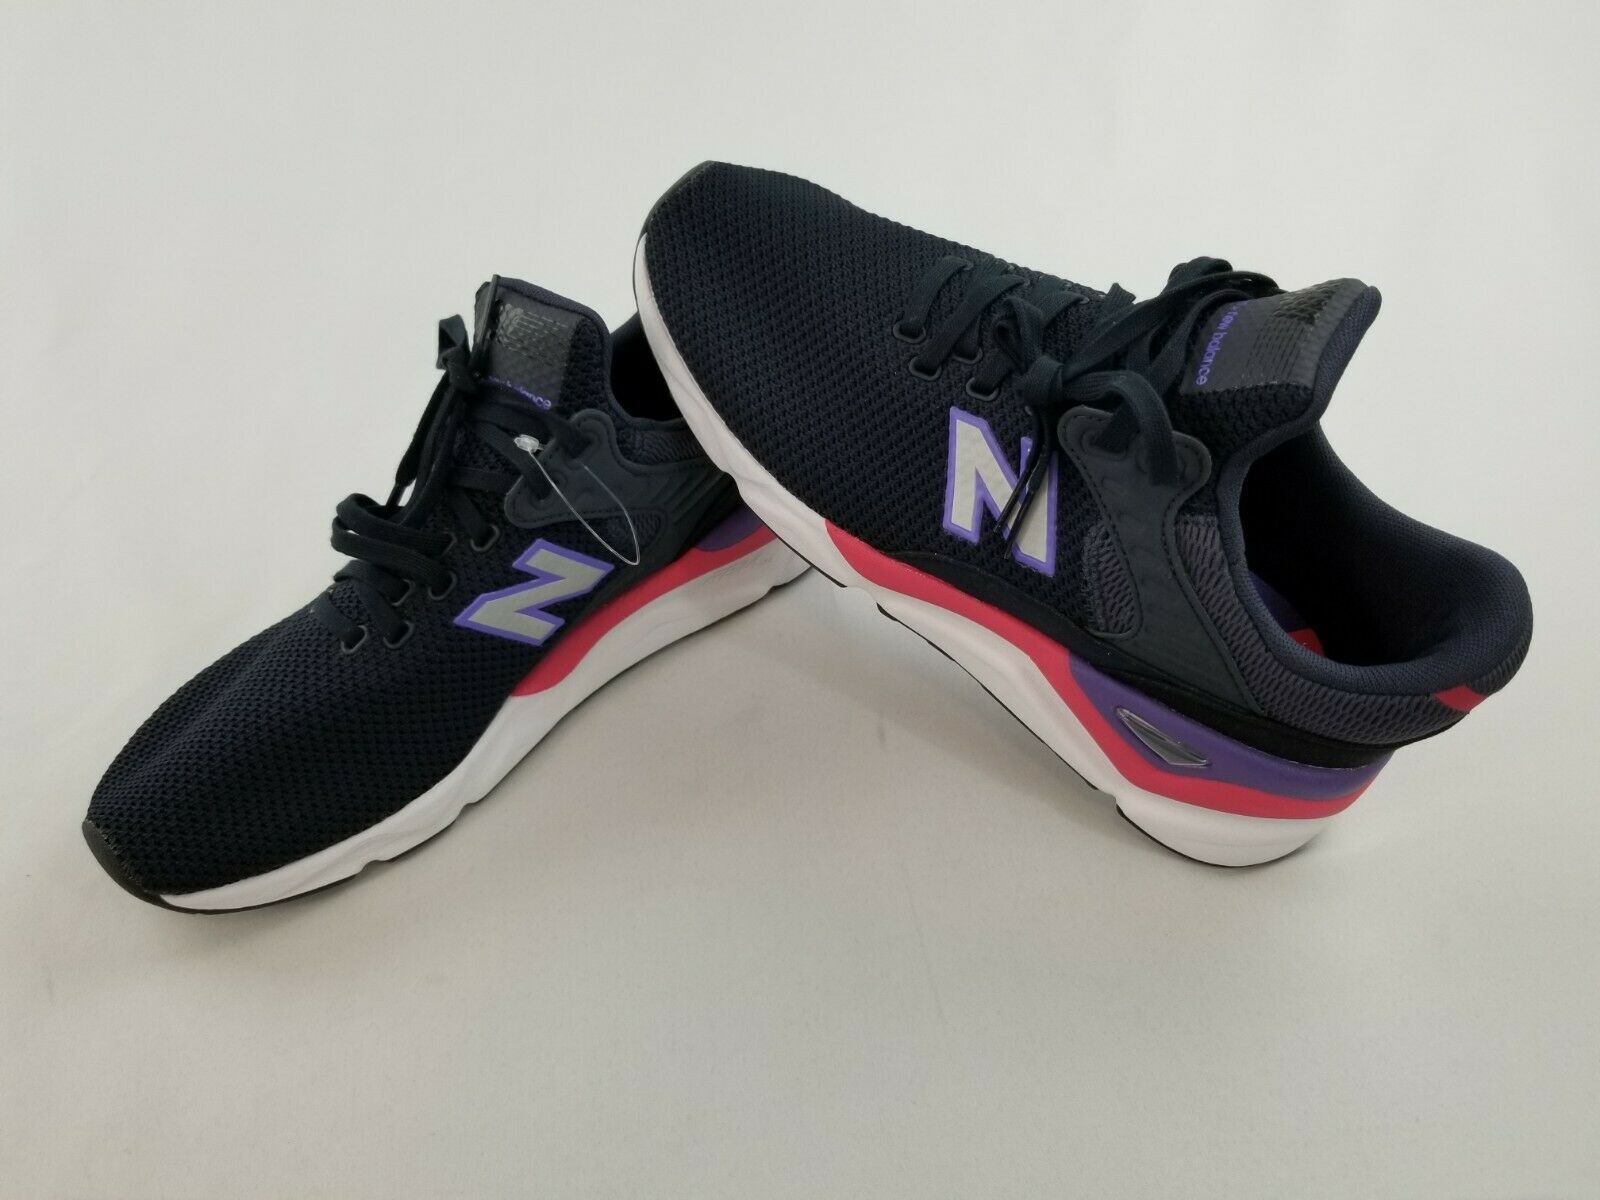 Neu New Balance Herren Schuhe Sneakers X-90 Laufen MSX90CRC Grau 7.5 D Msrp